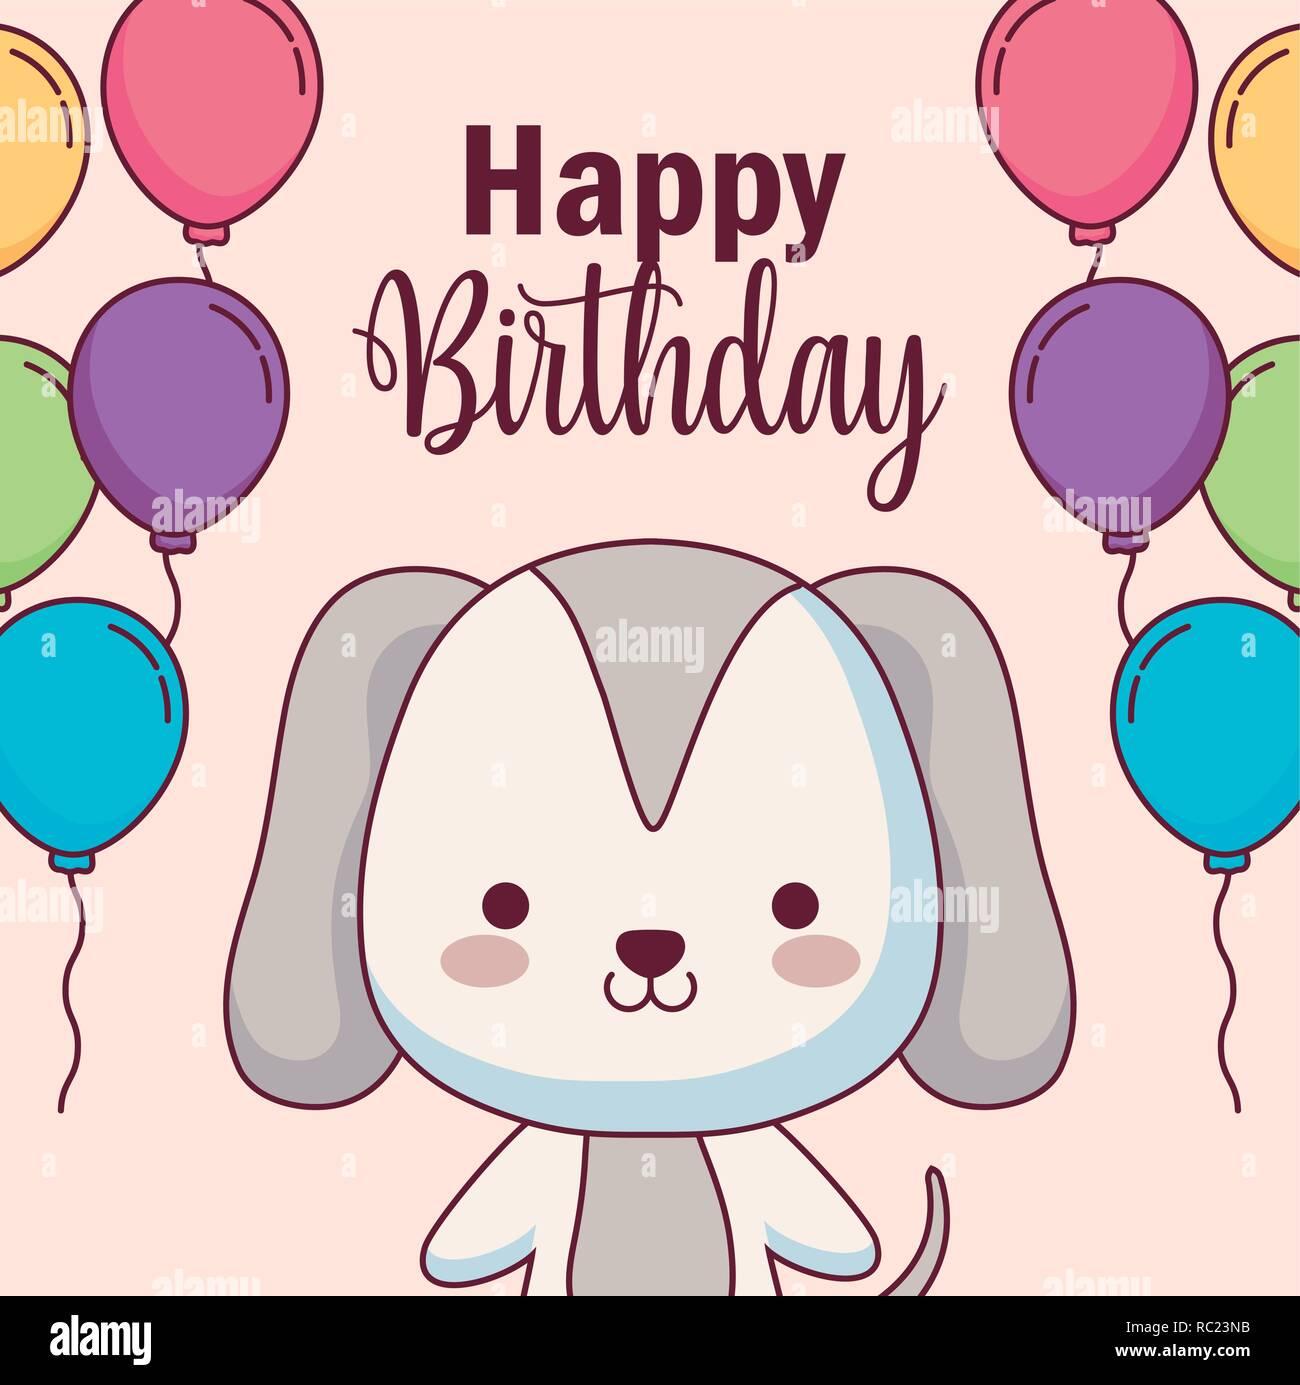 Cute Dog Happy Birthday Card With Balloons Helium Vector Illustration Design Stock Vector Image Art Alamy